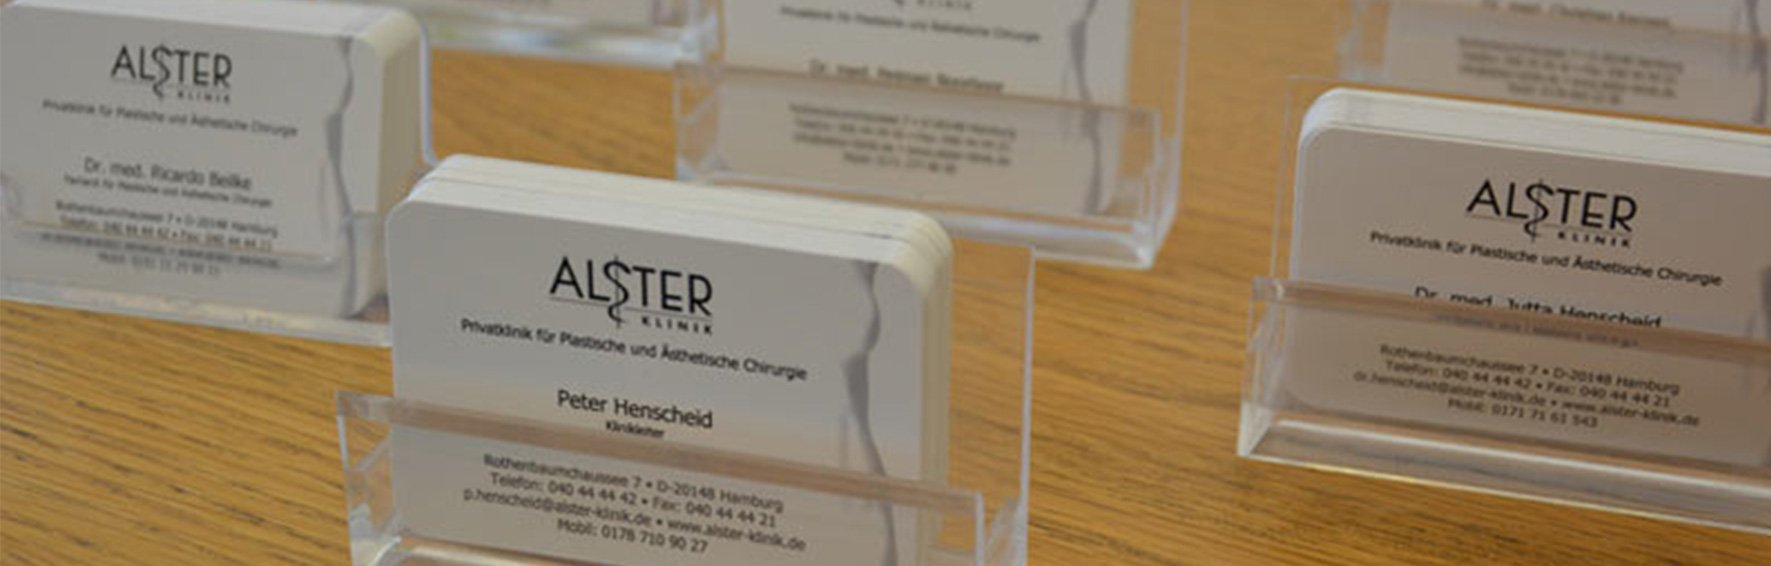 Alster-Klinik Visitenkarte Dr. Henscheid